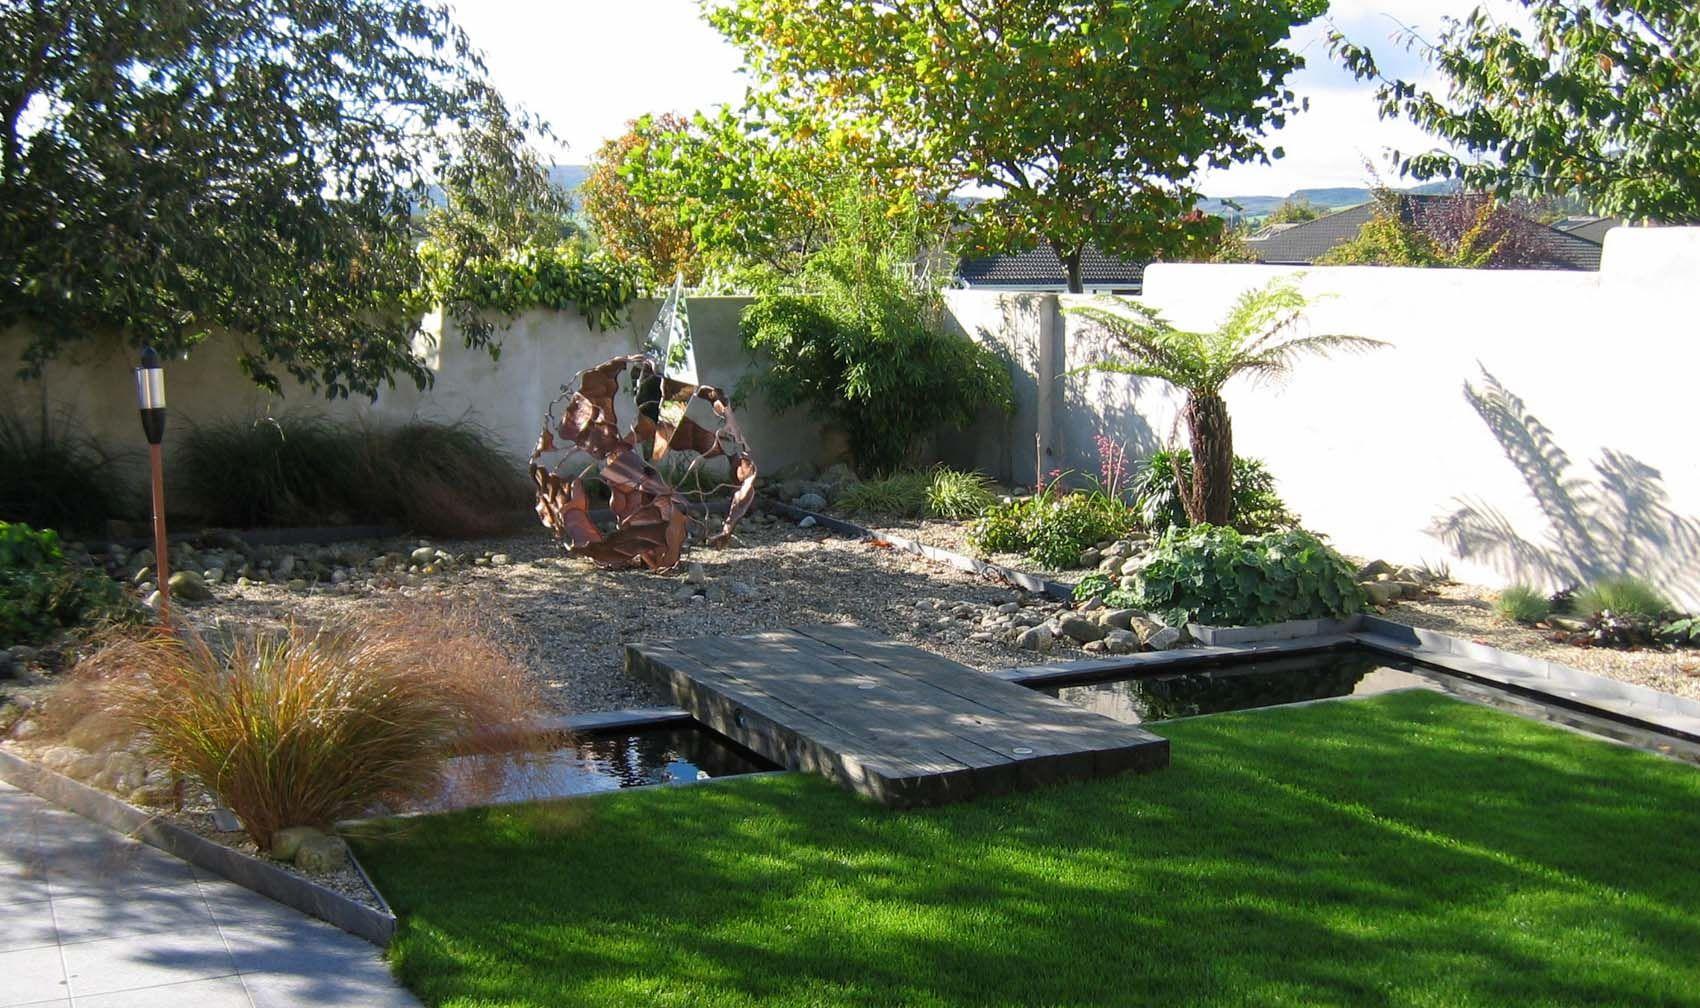 Landscape Design Contemporary Garden Design Ideas And Construction Hugh Ryan Landscape Design Irel Contemporary Garden Design Garden Design Landscape Design